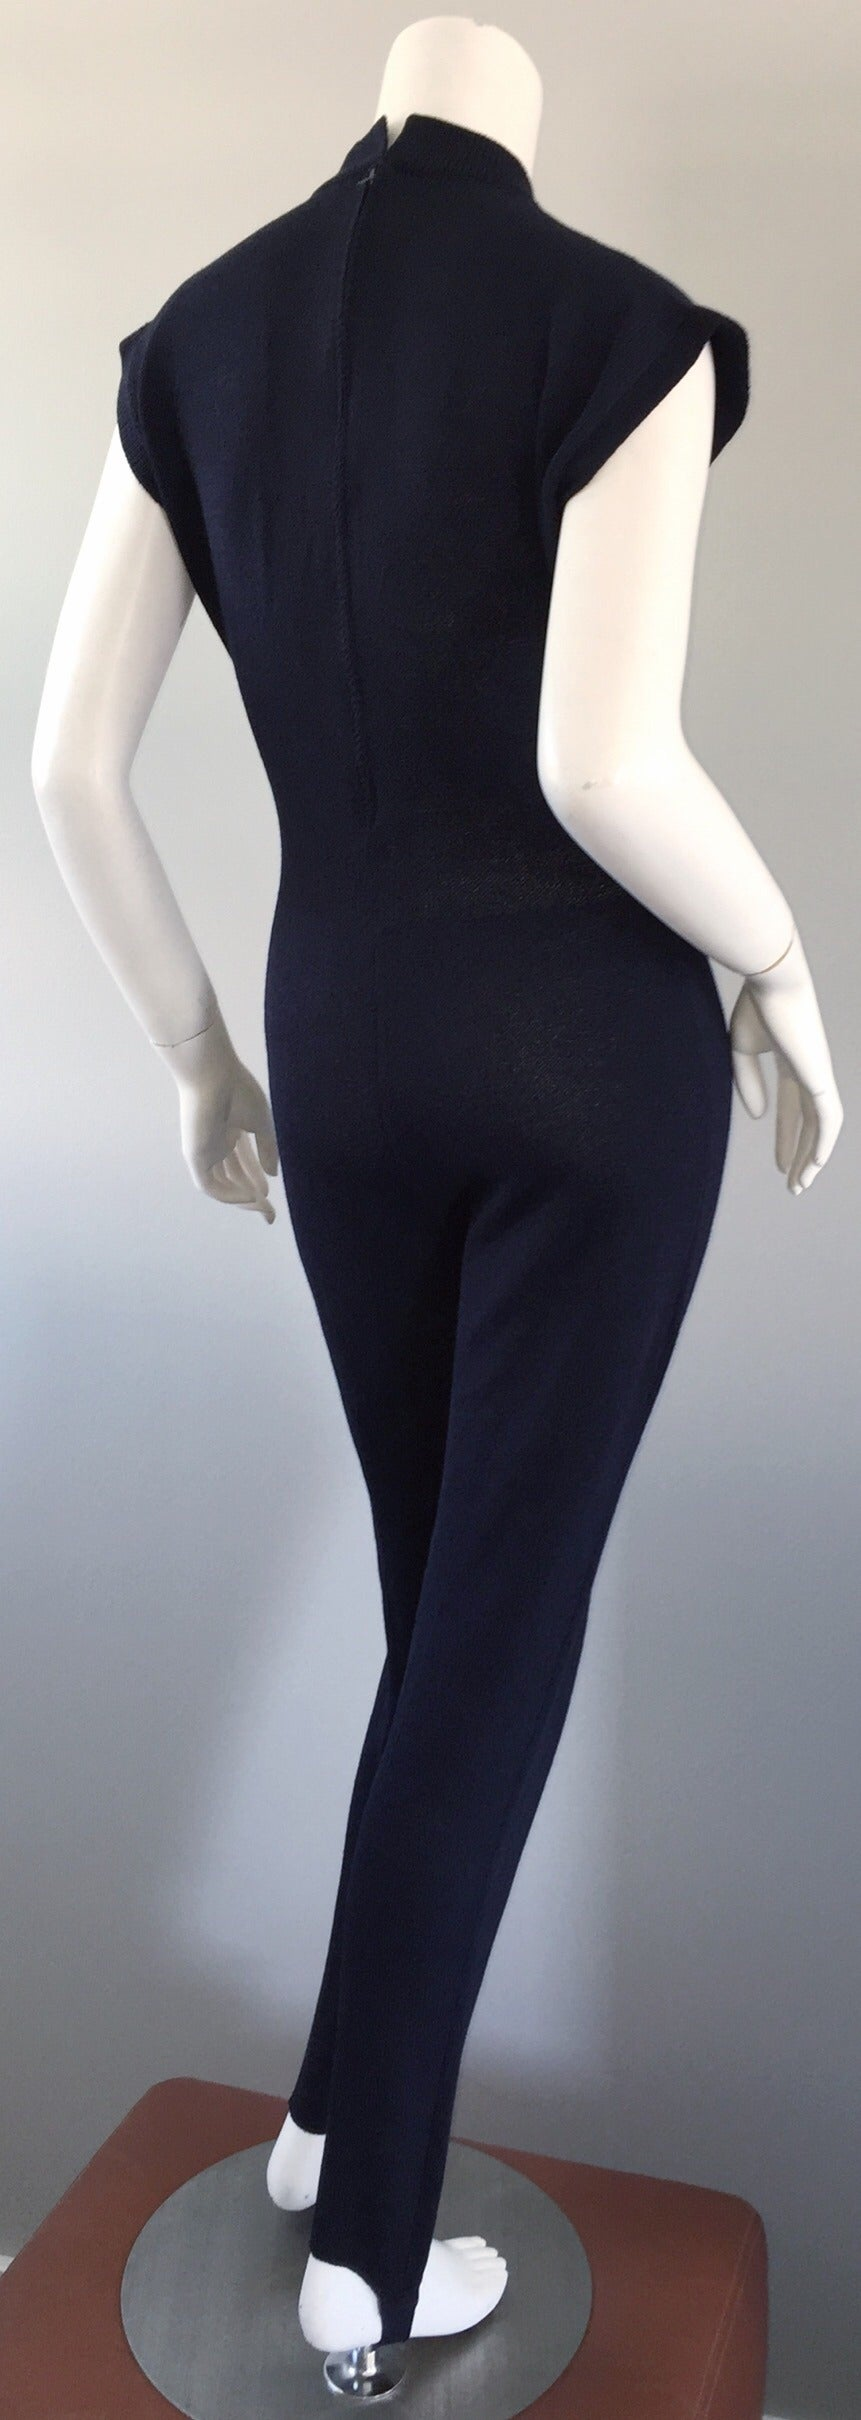 15c8148c0bd6 Vintage St. John by Marie Gray Navy Blue Santana Knit Jumpsuit w  Stirrup  Pants